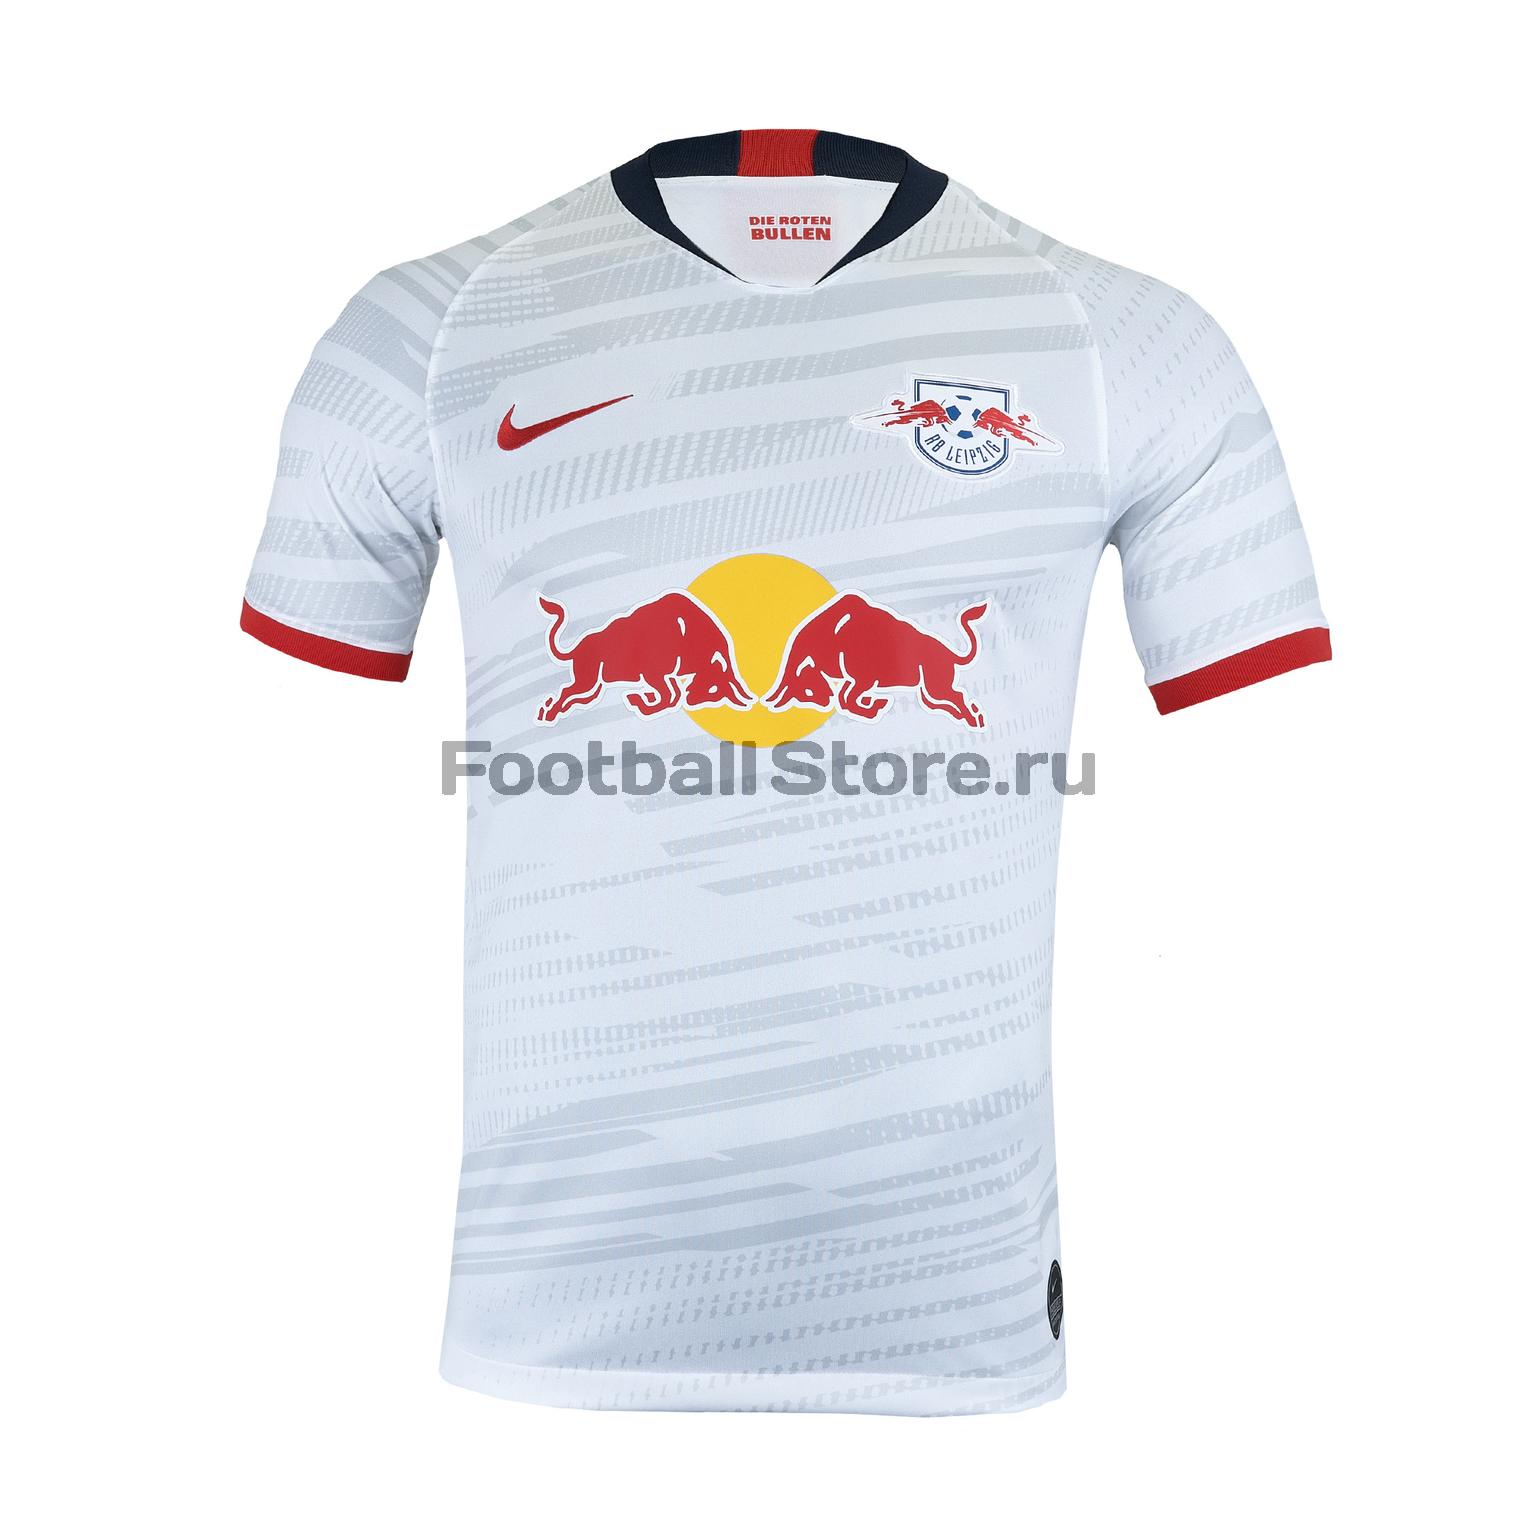 Футболка игровая домашняя Nike RB Leipzig 2019/20